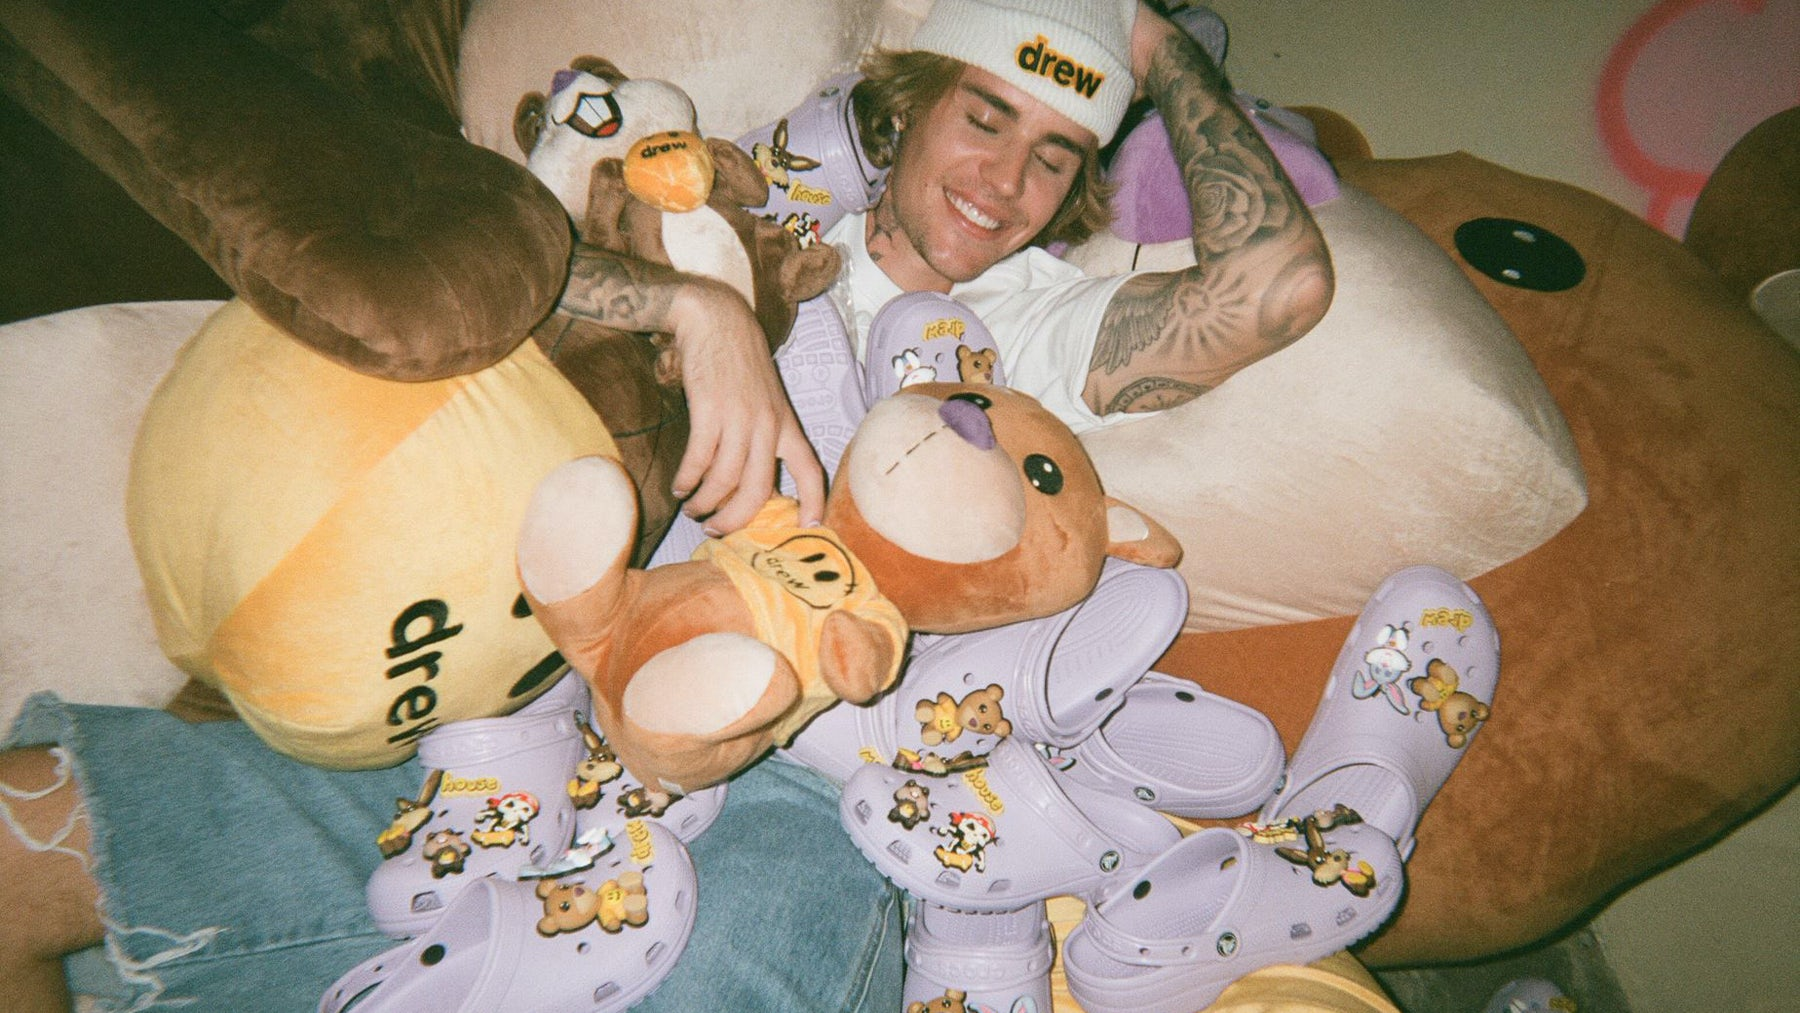 Justin Bieber with his Crocs collab. Crocs.